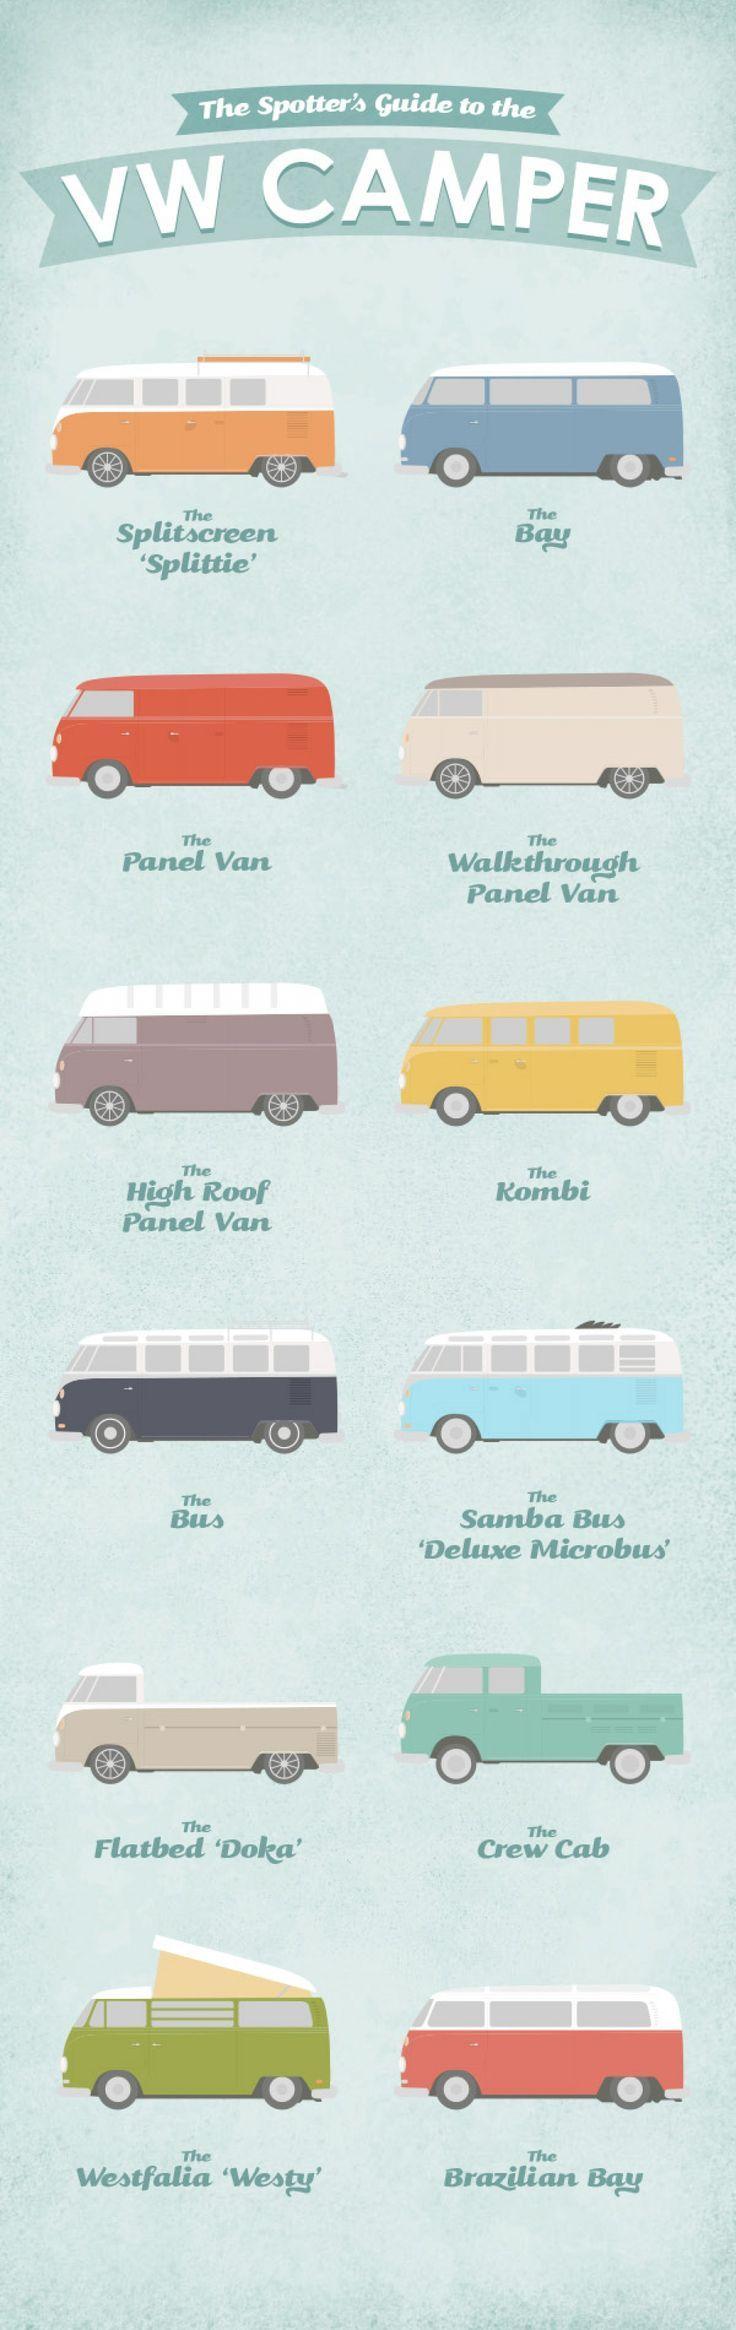 best volkswagen bus camper images on pinterest